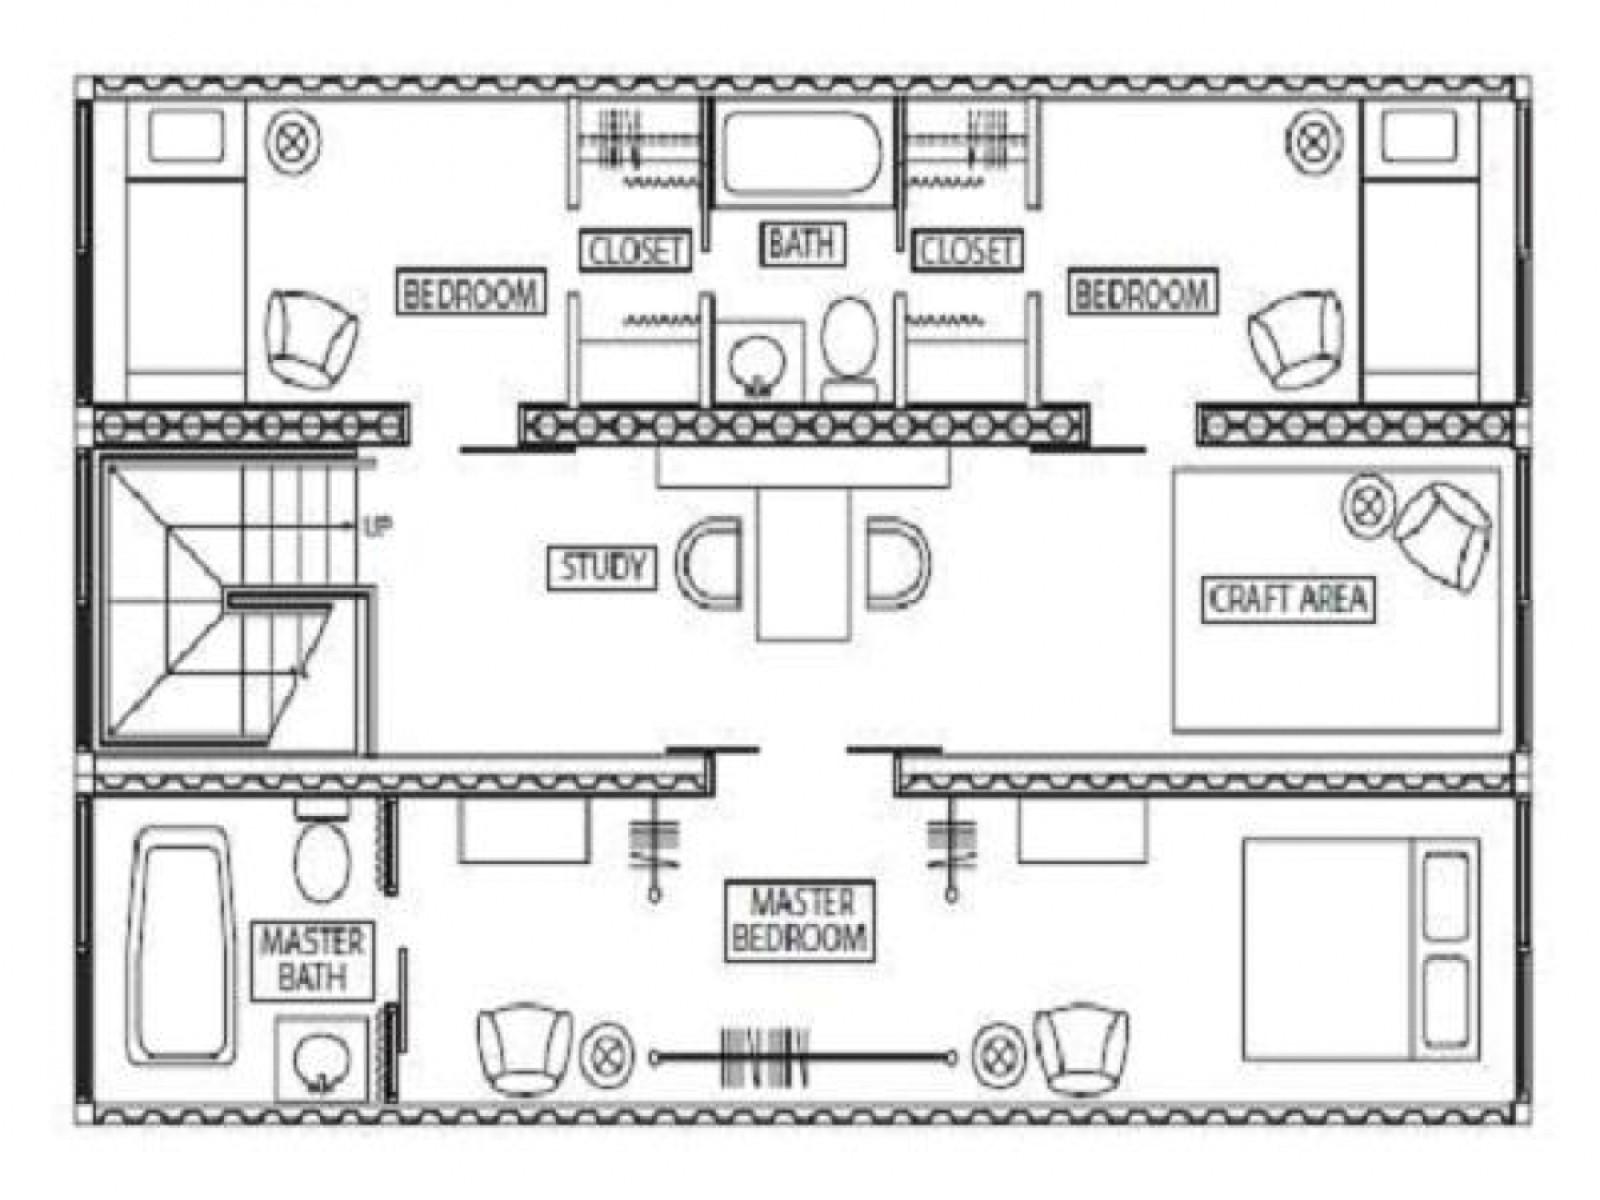 conex home plans container house design inside container home plans designs